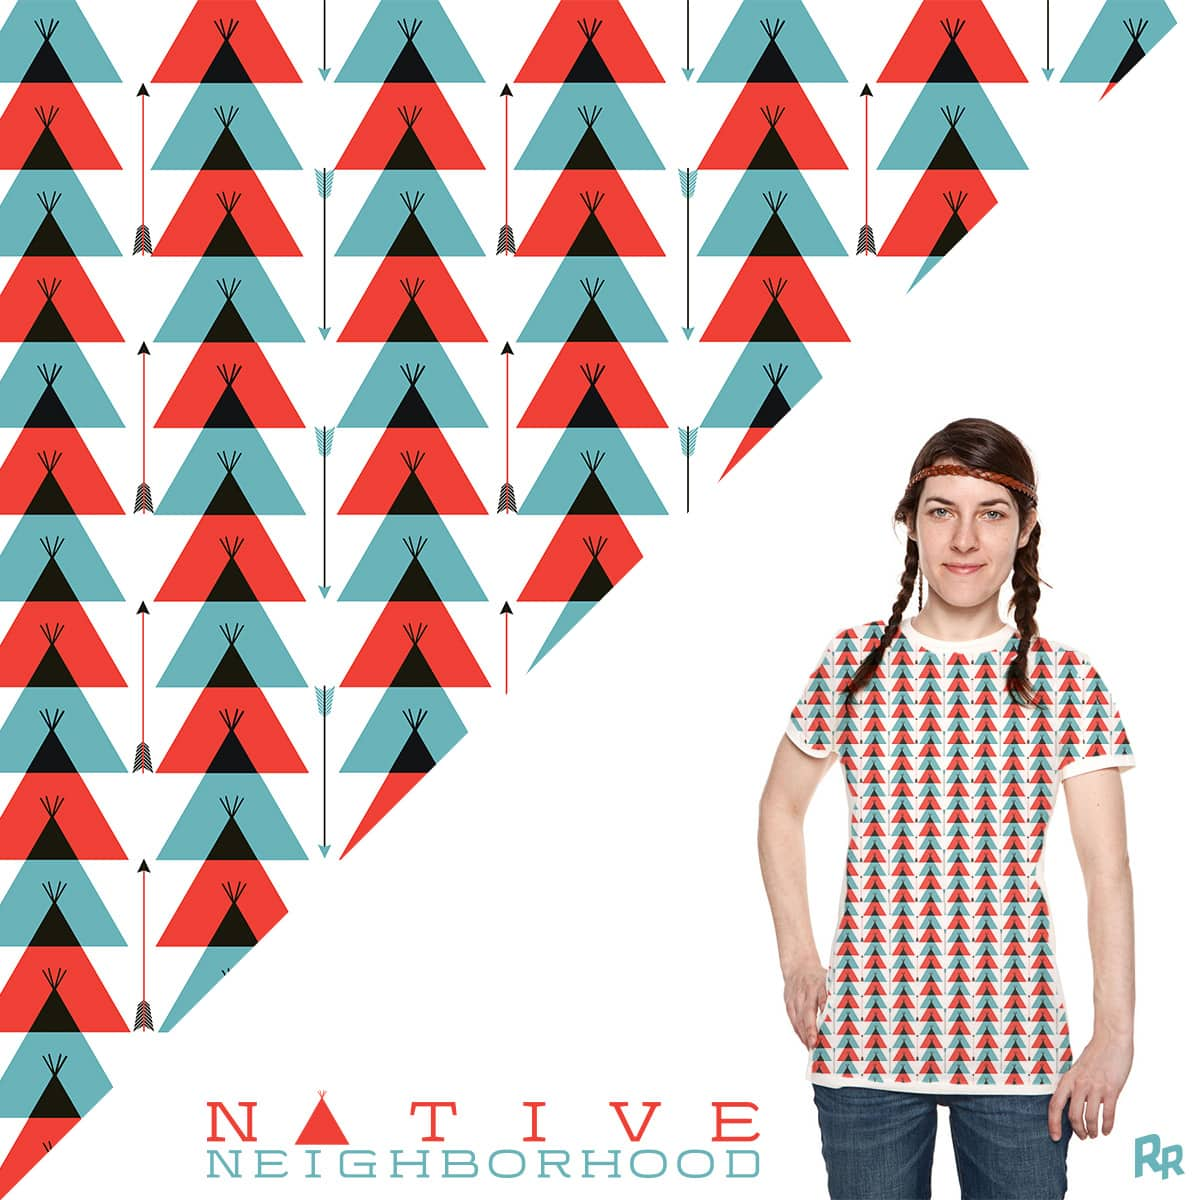 Native Neighborhood by Ryder on Threadless